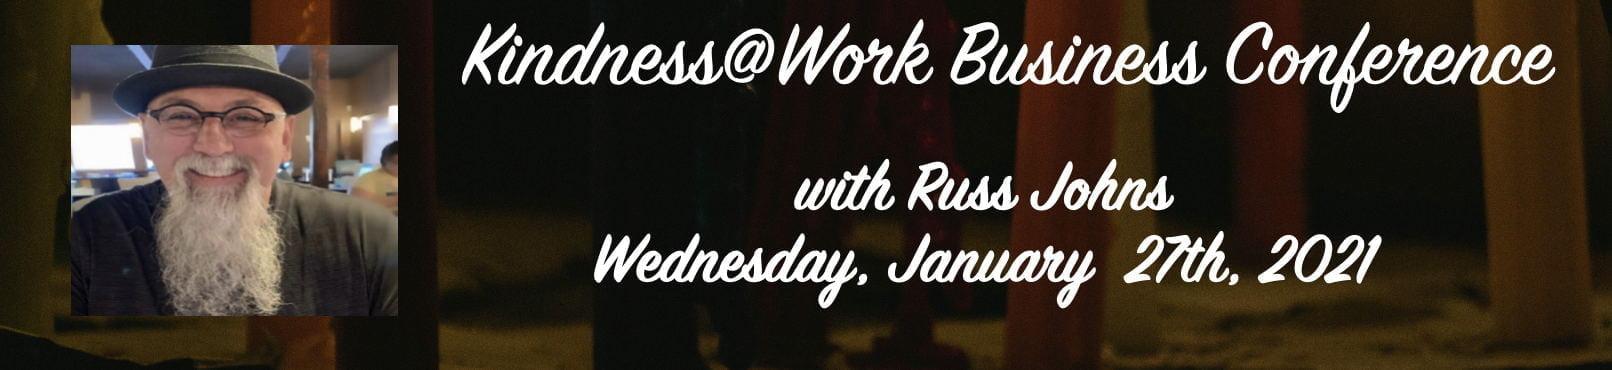 Russ Johns Keynote Speaker Kindness@Work Business Conference 3021